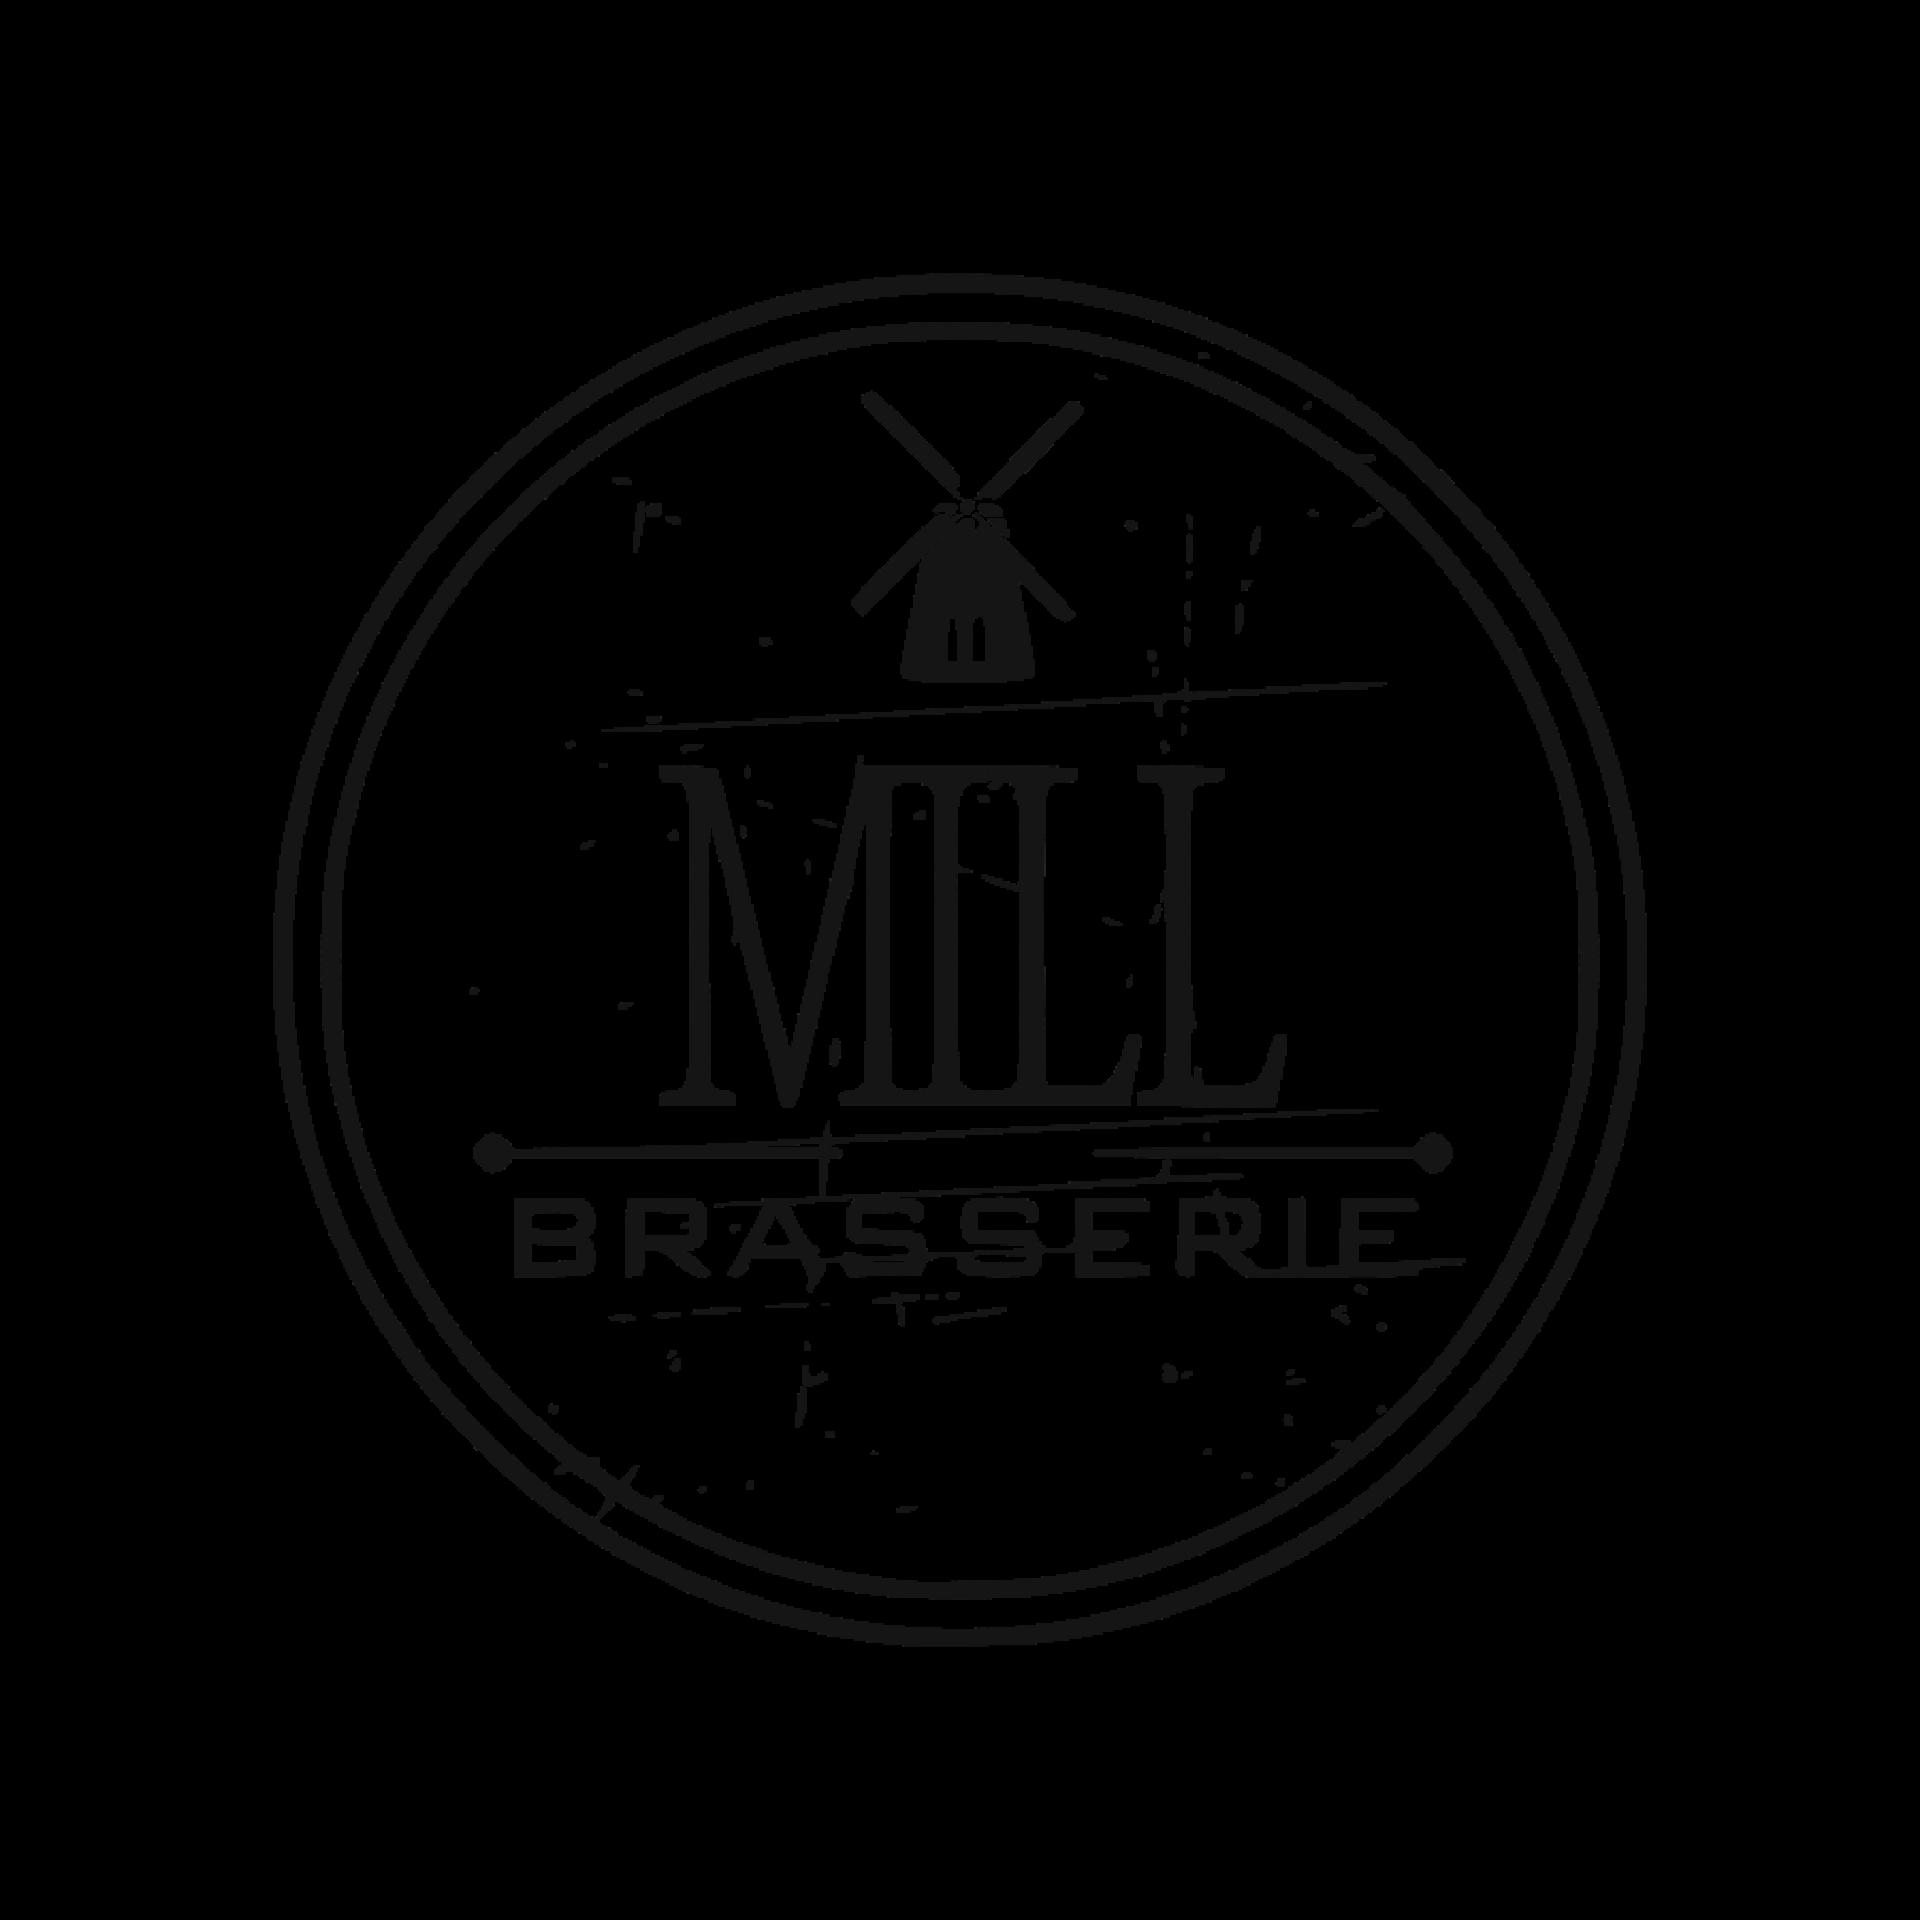 Brasserie Mill